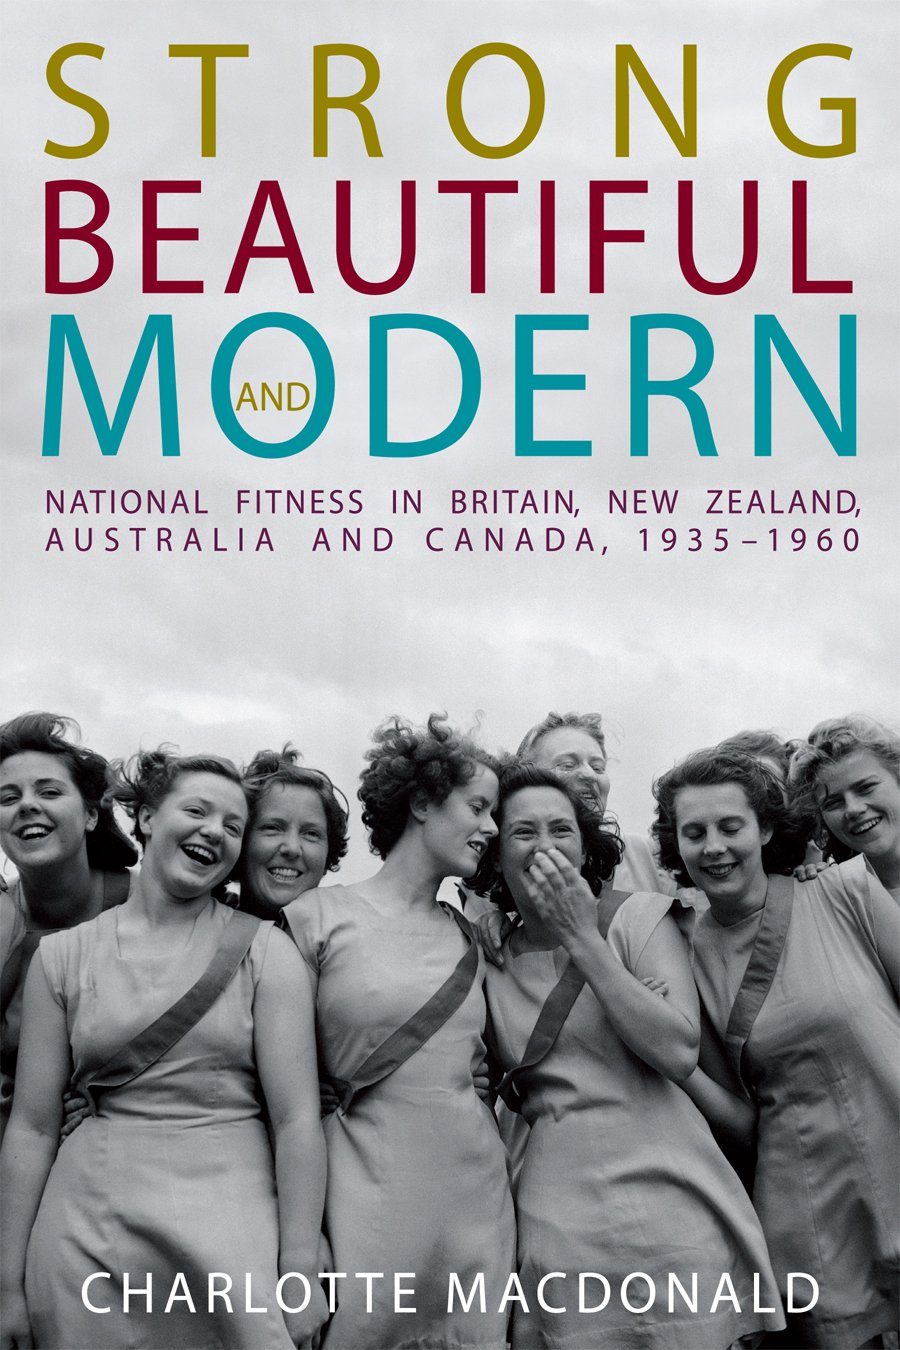 Strong beautiful modern by Macdonald